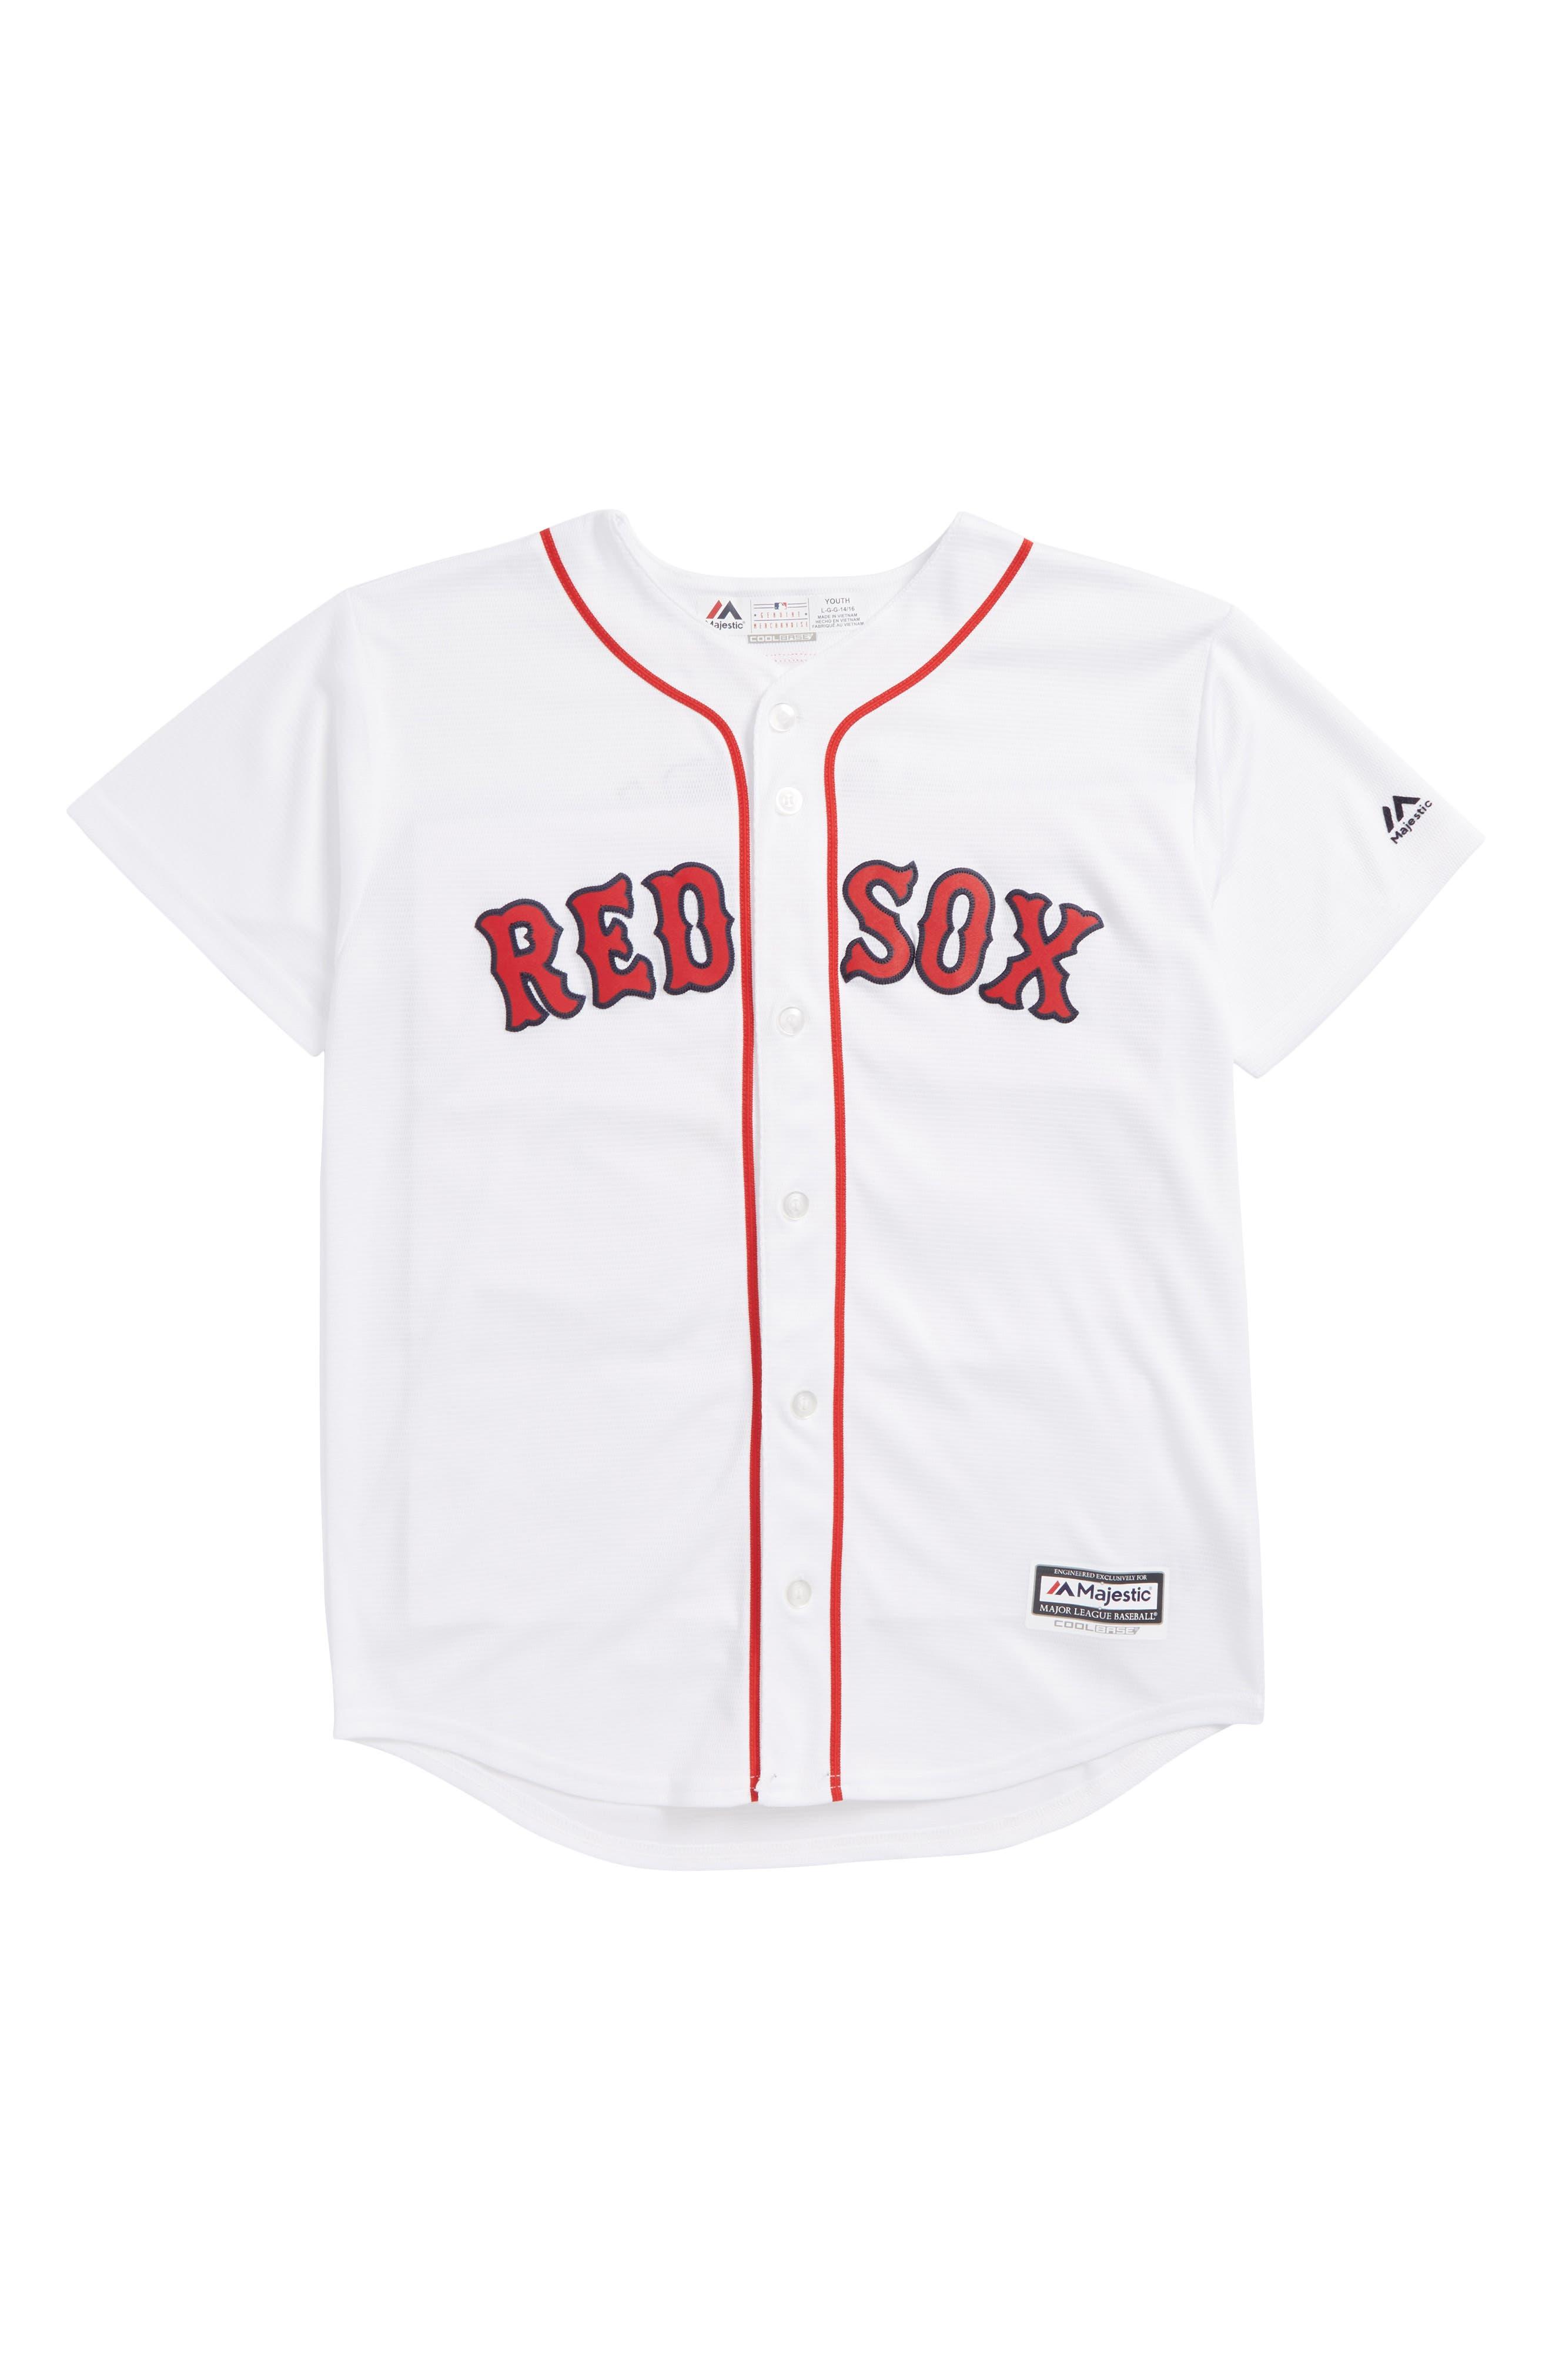 Boston Red Sox - Dustin Pedroia Baseball Jersey,                             Main thumbnail 1, color,                             100